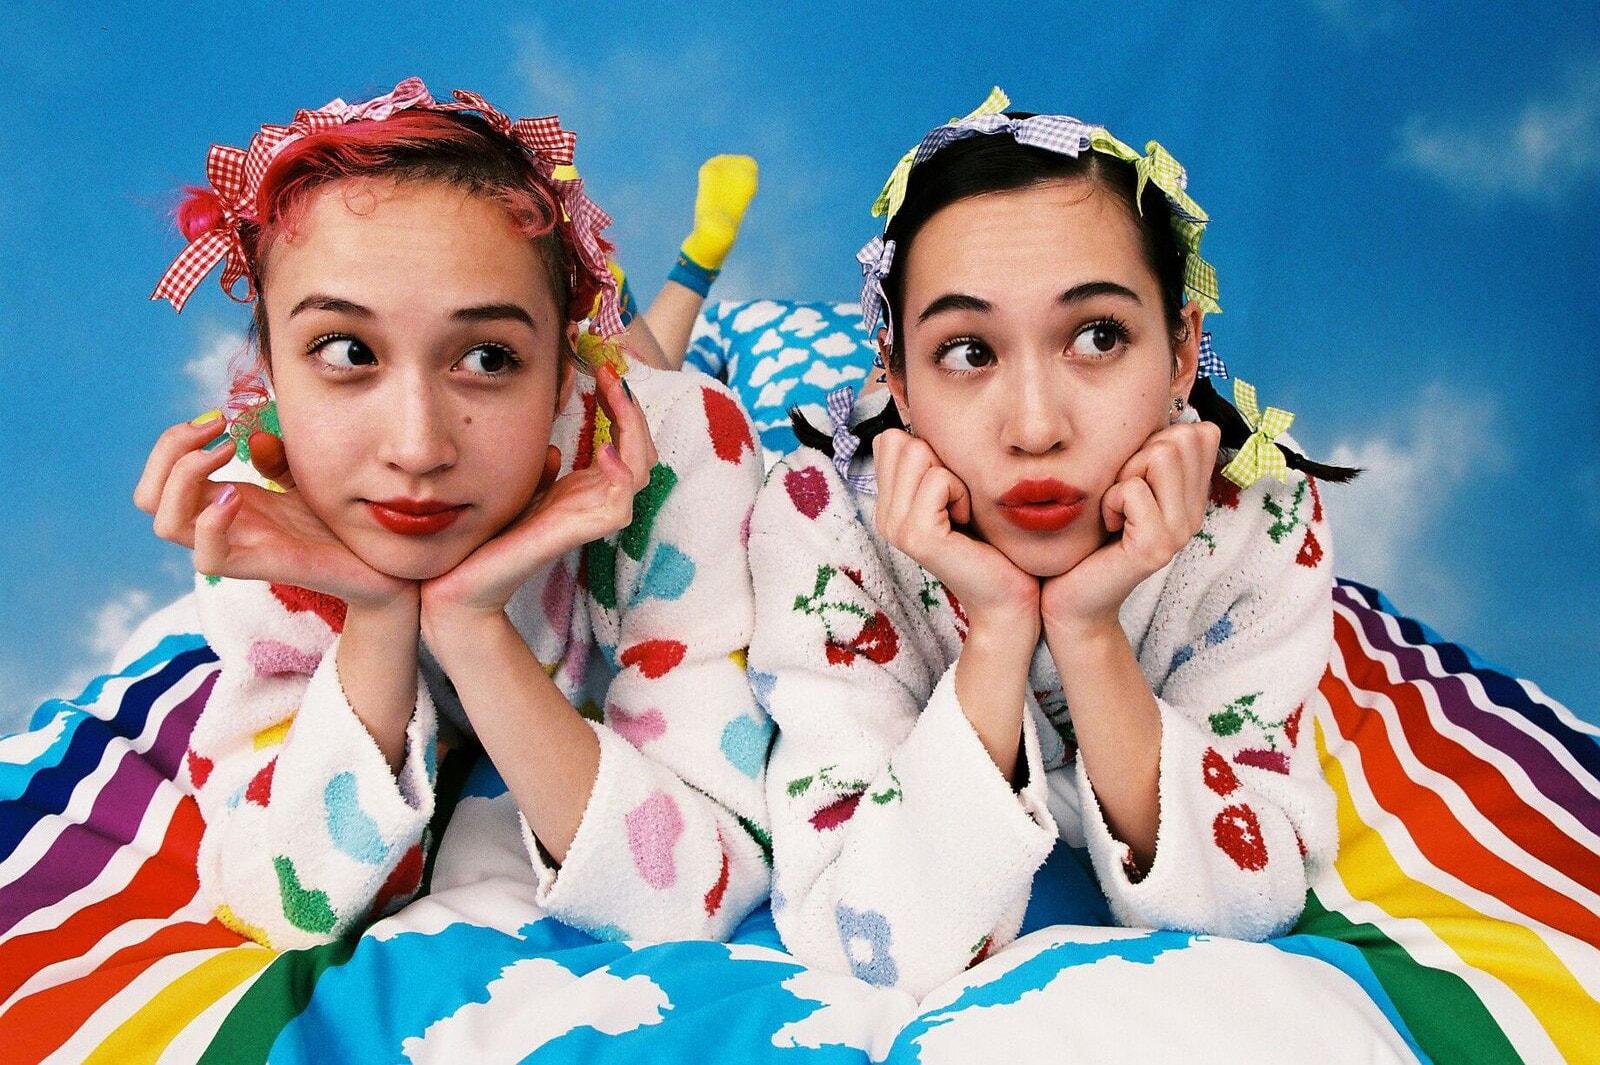 HYPEBEAST 專訪水原希子&水原佑果分享她們對於潮流與造型的看法